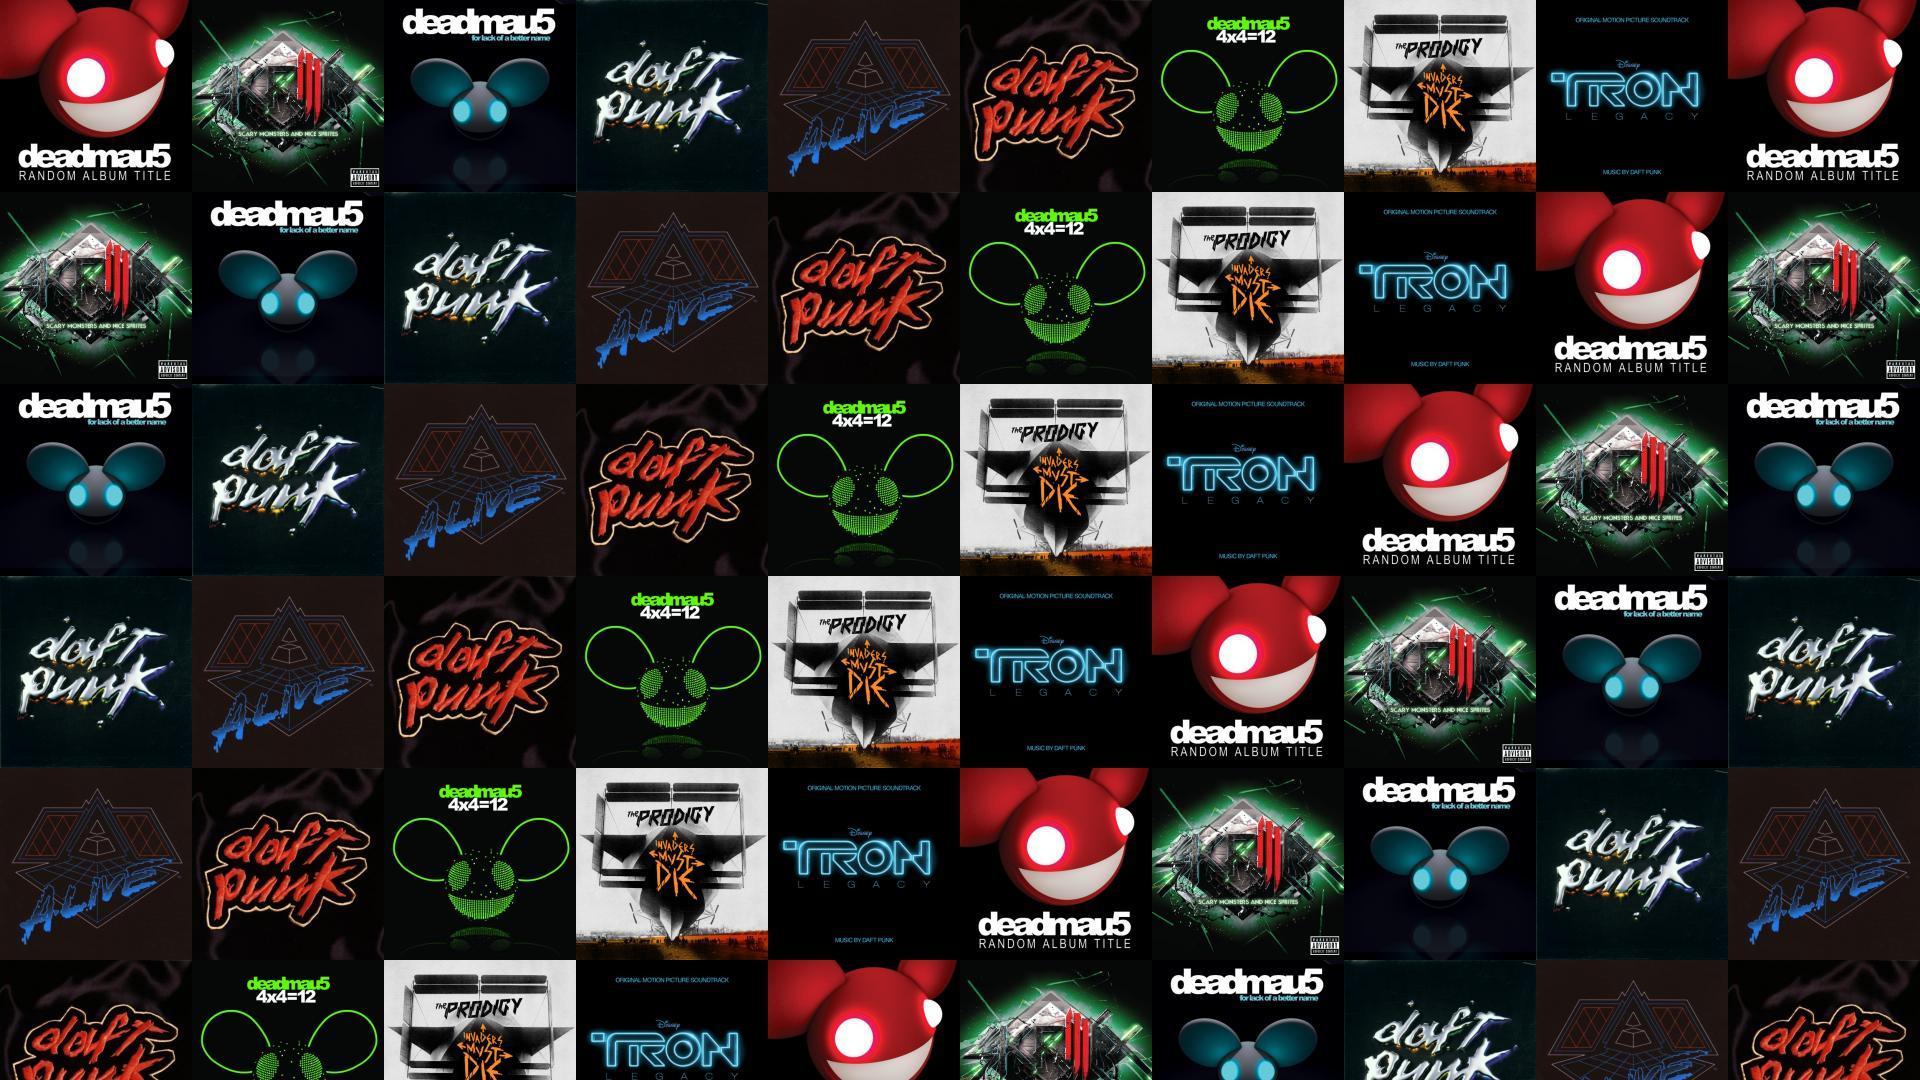 Deadmau5 Random Album Title Skrillex Scary Monsters Nice Wallpaper